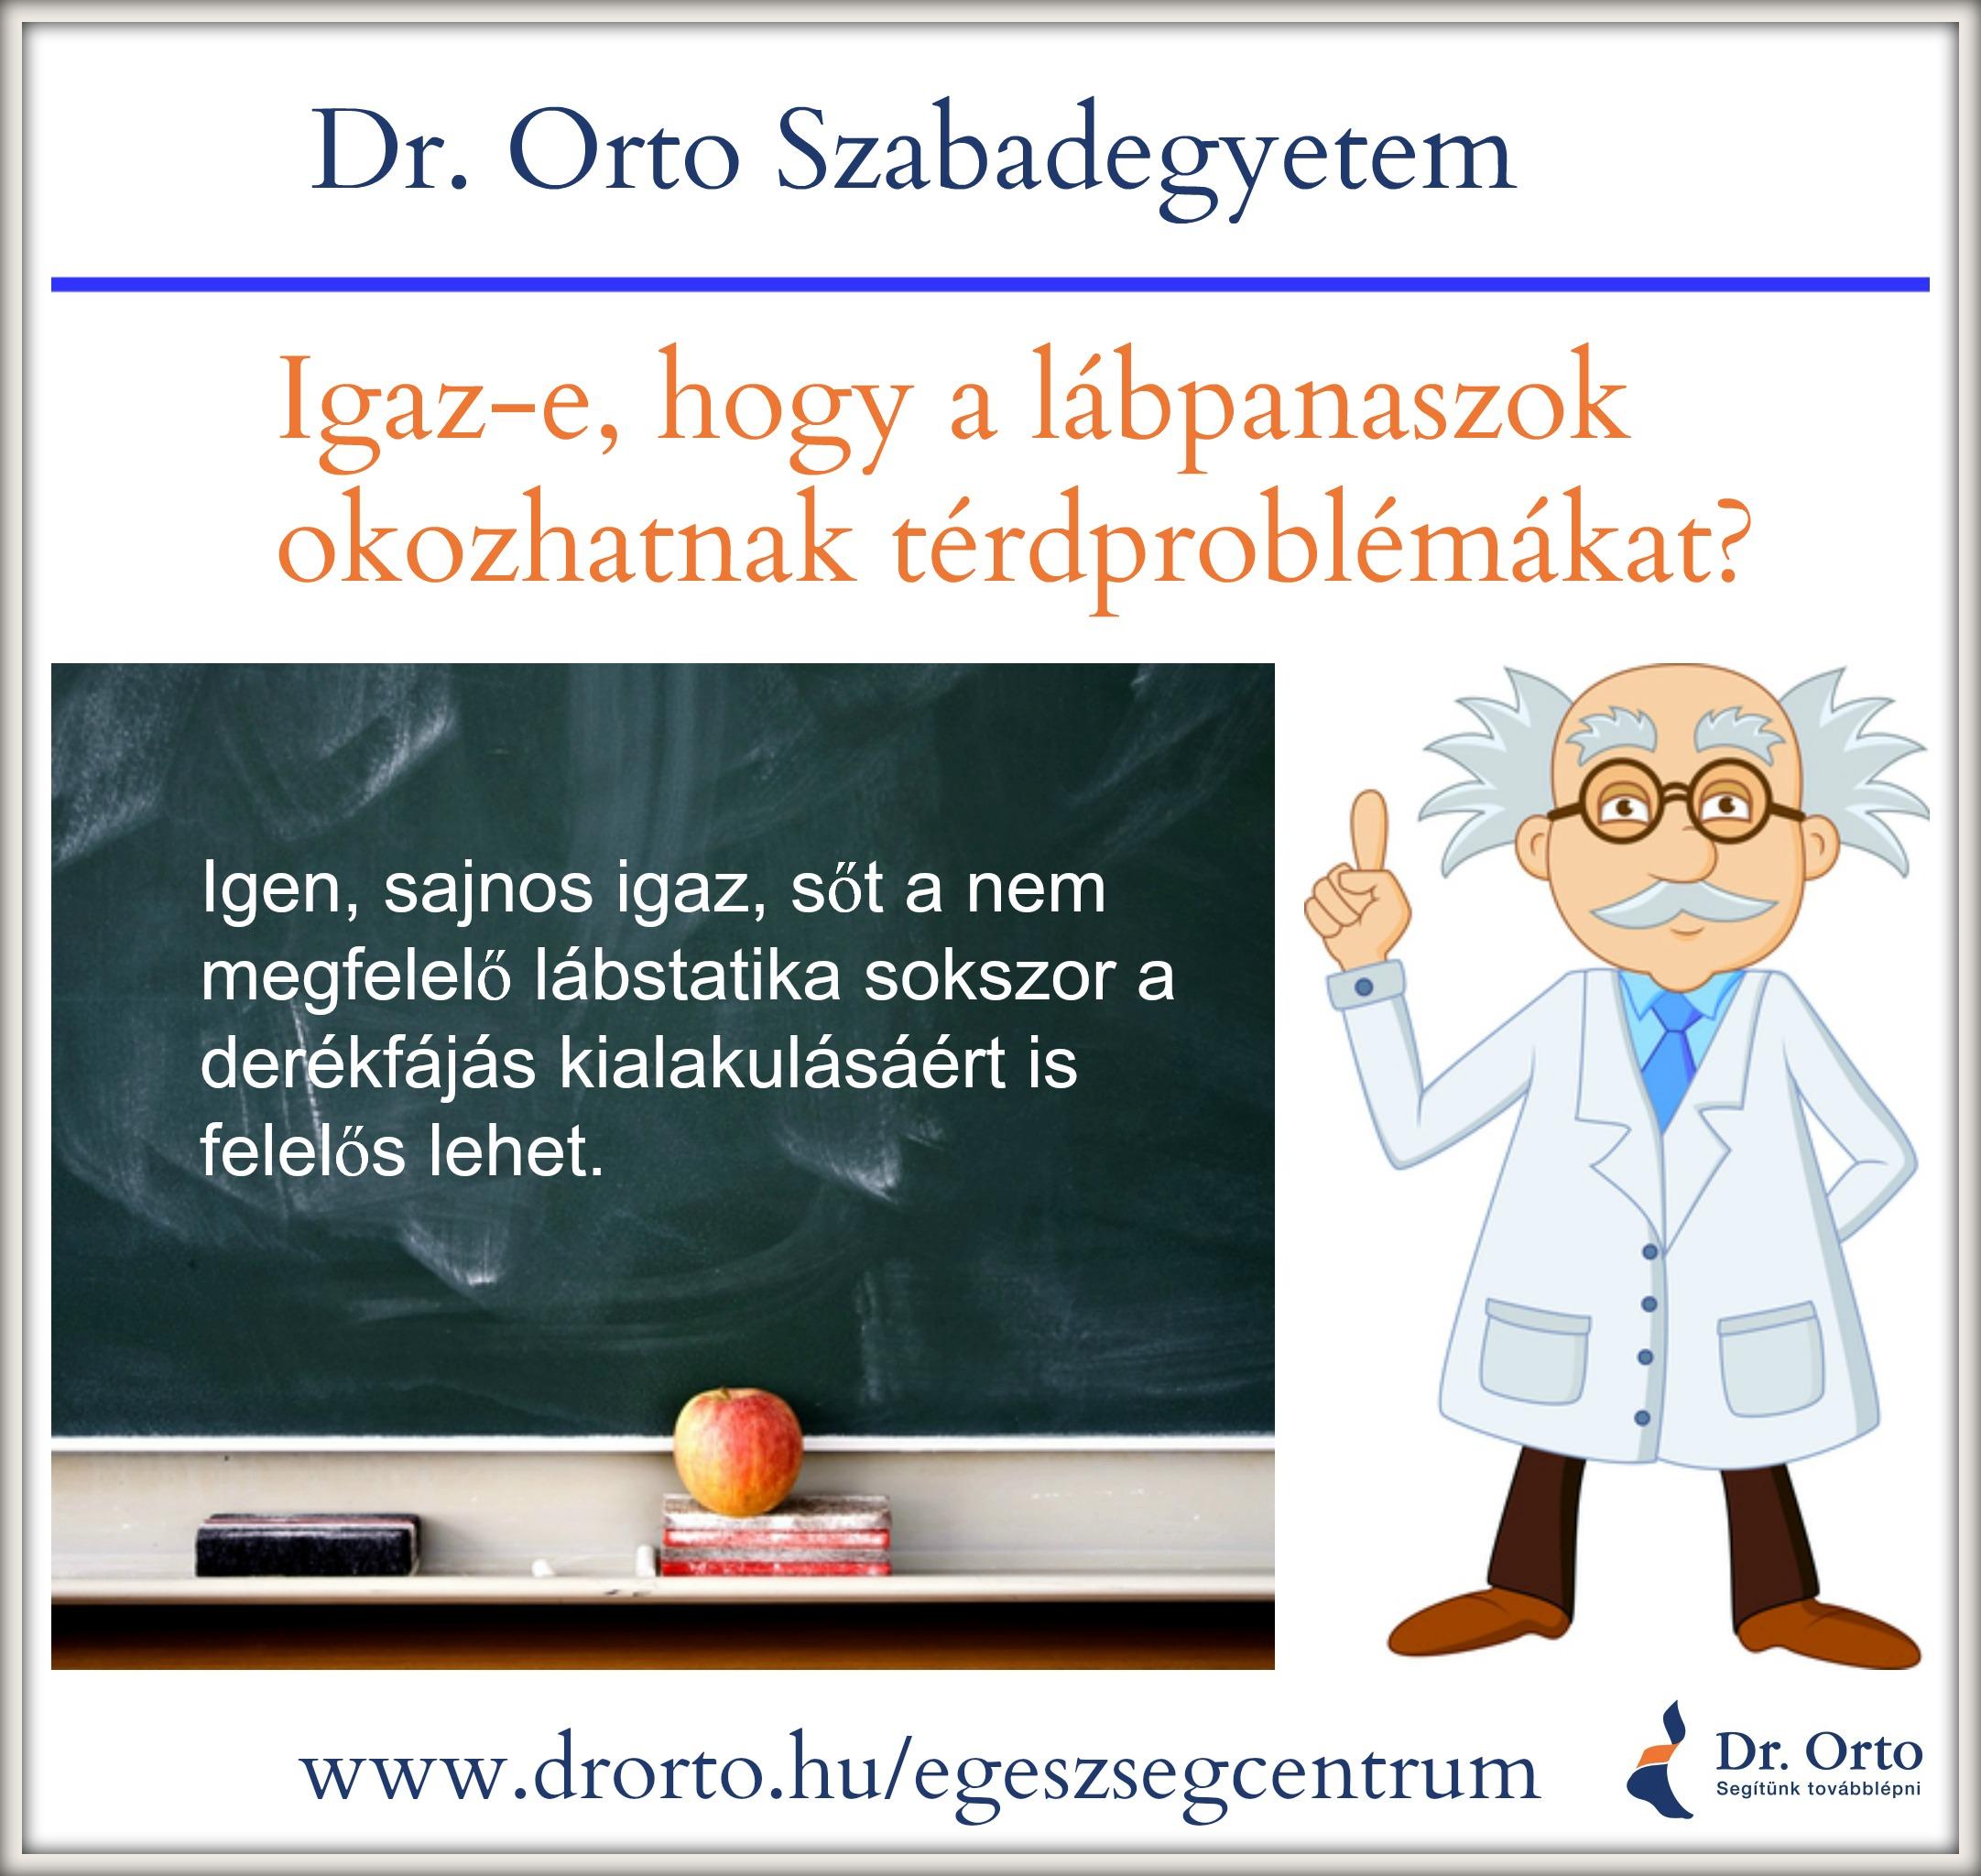 dr-orto-szabadegyetem-1post